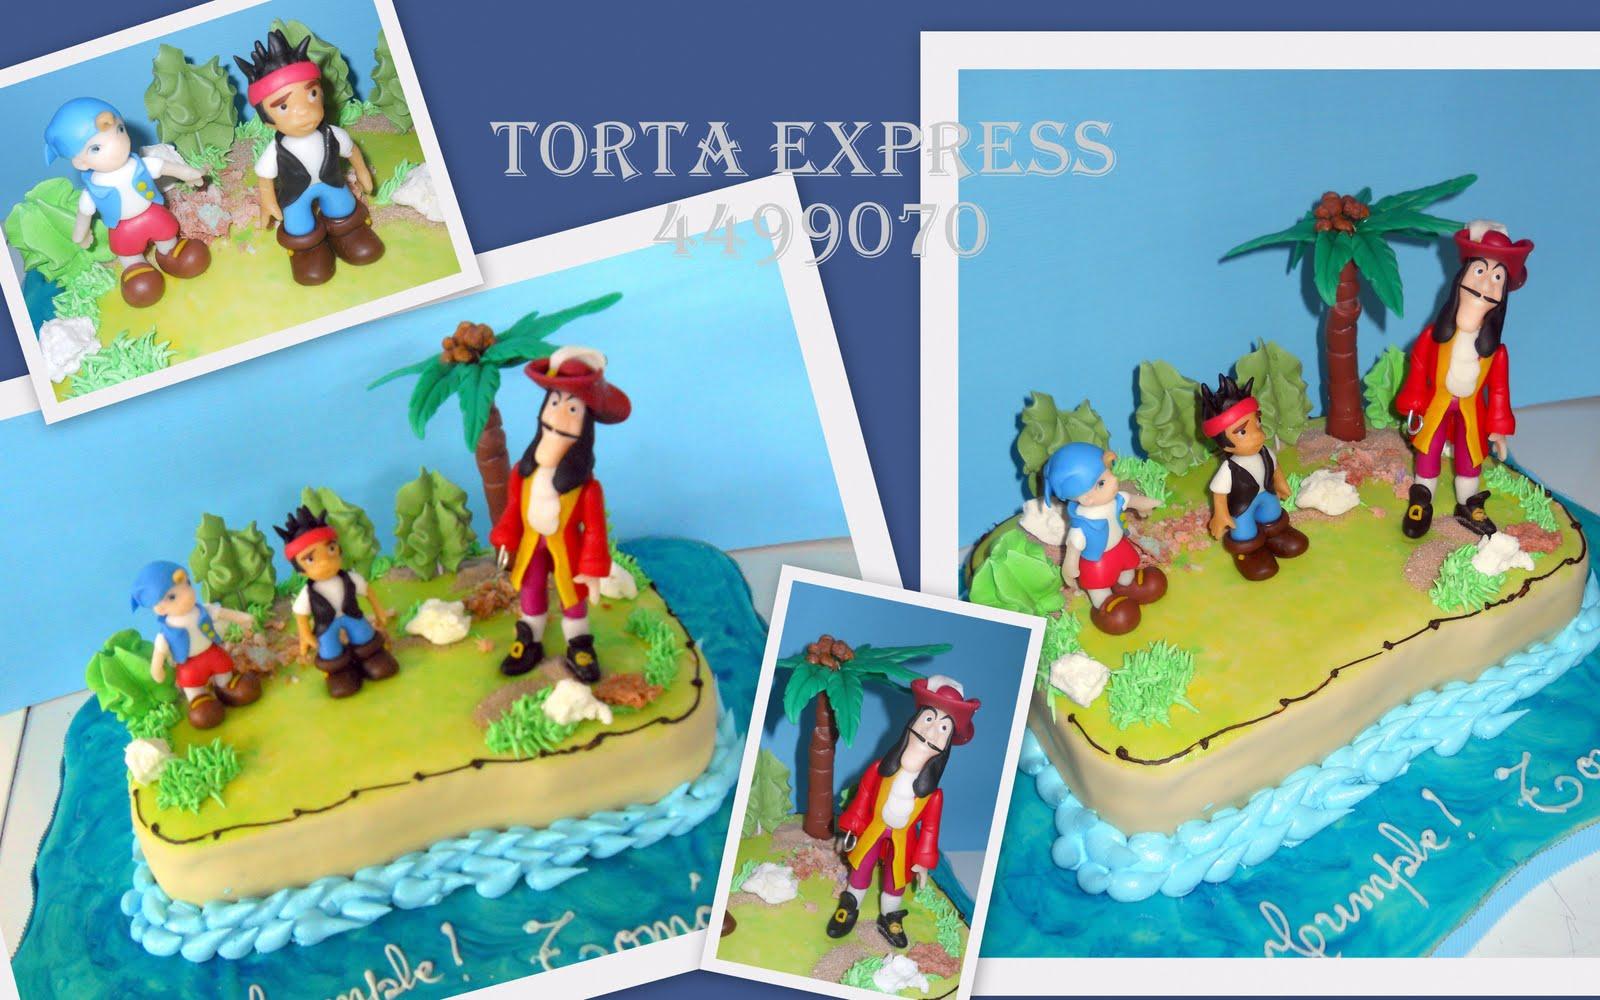 TORTAS EXPRESS ARTERSANALES